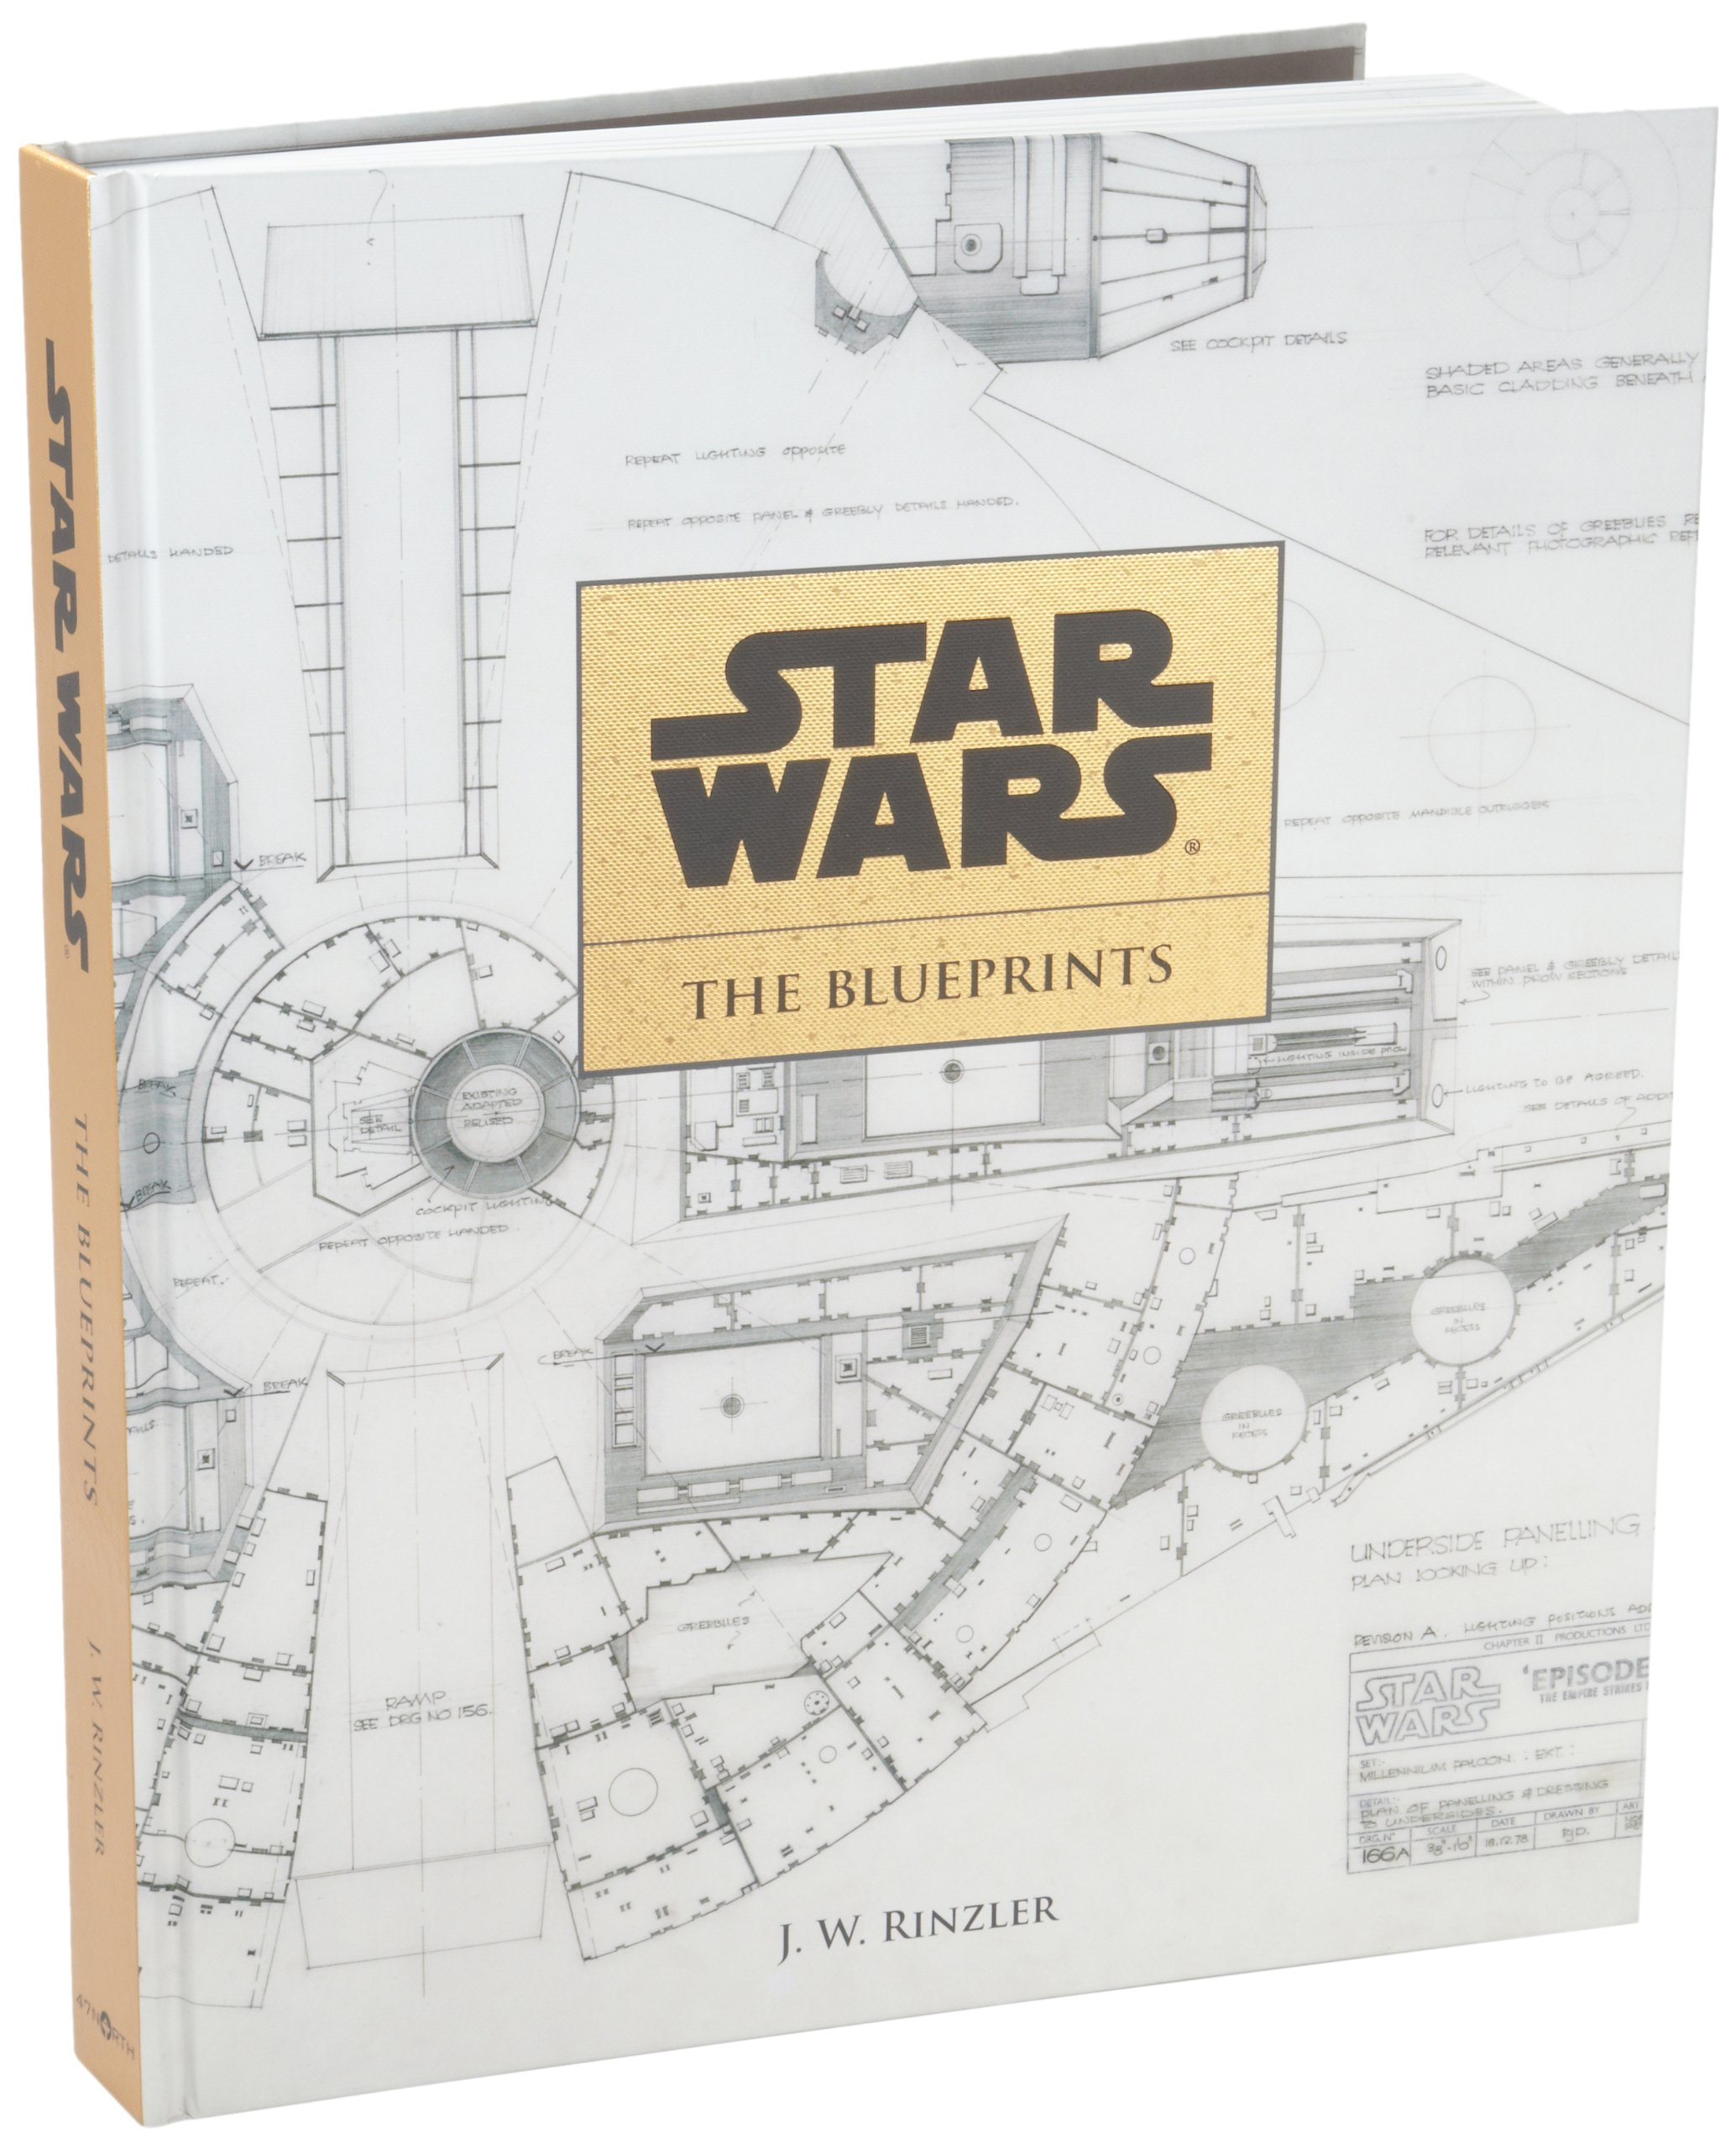 Star Wars Coffee Table Book Rascalartsnyc